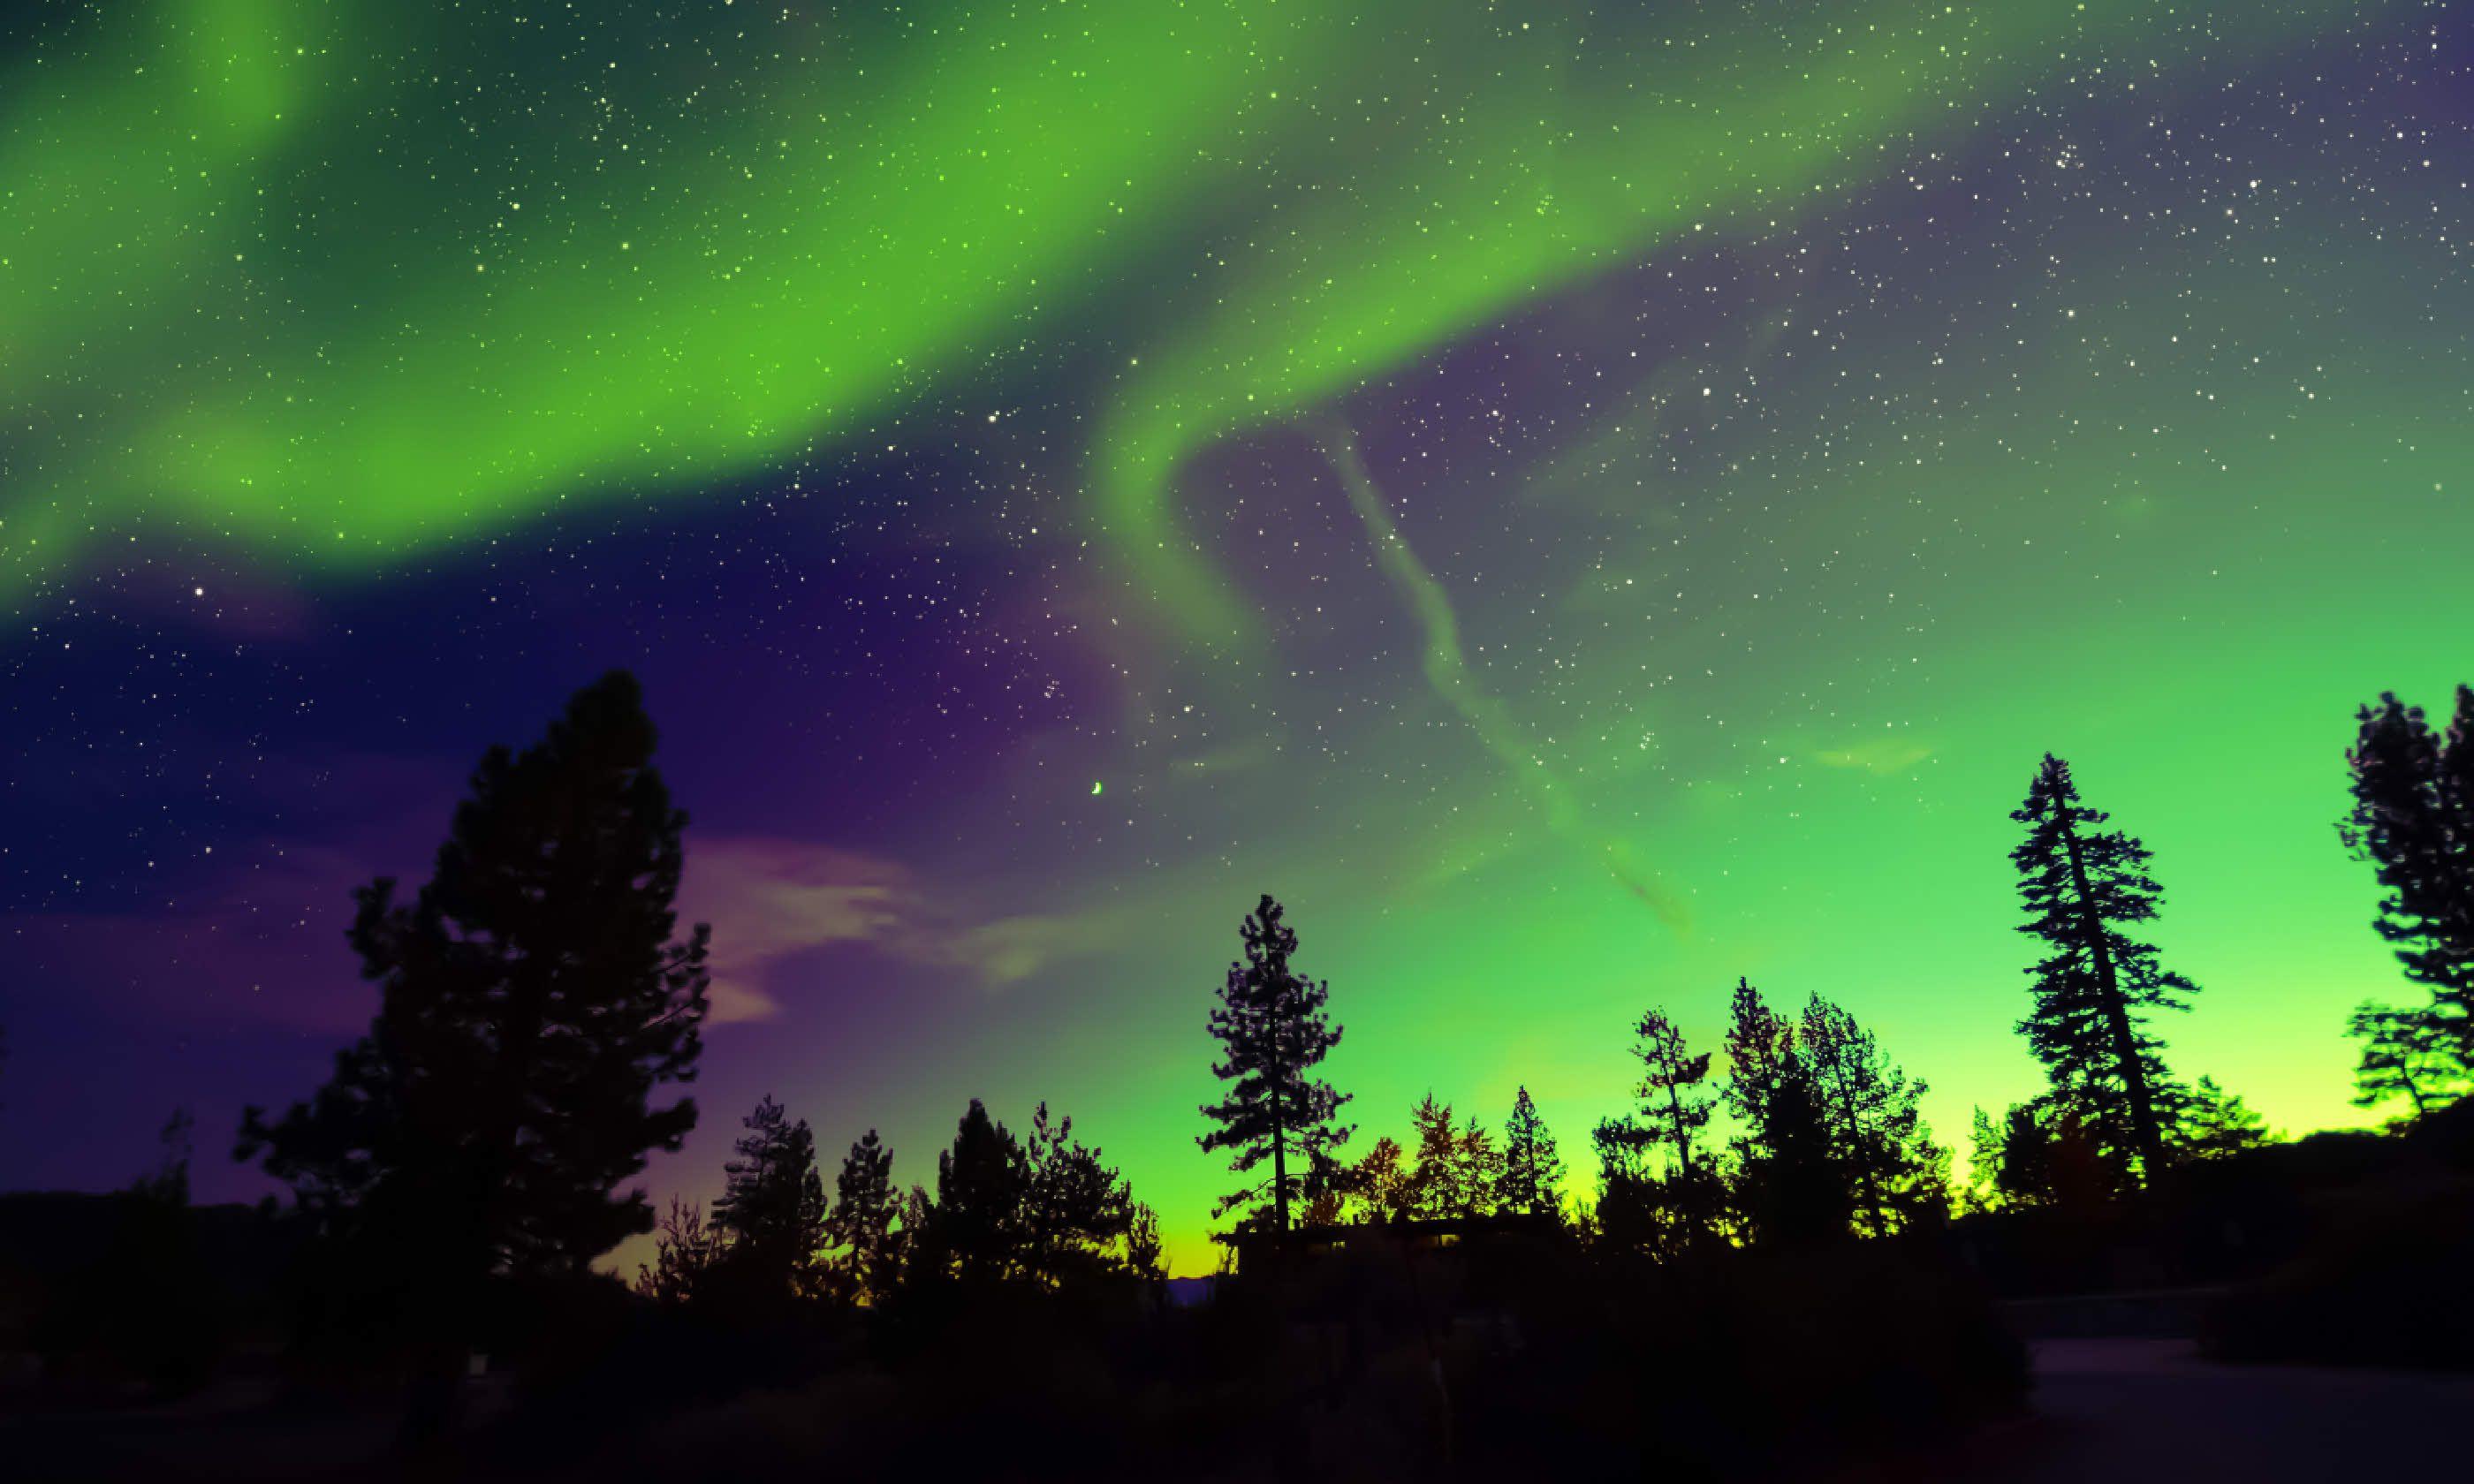 Northern Lights Aurora Borealis In The Night Sky (Shutterstock)